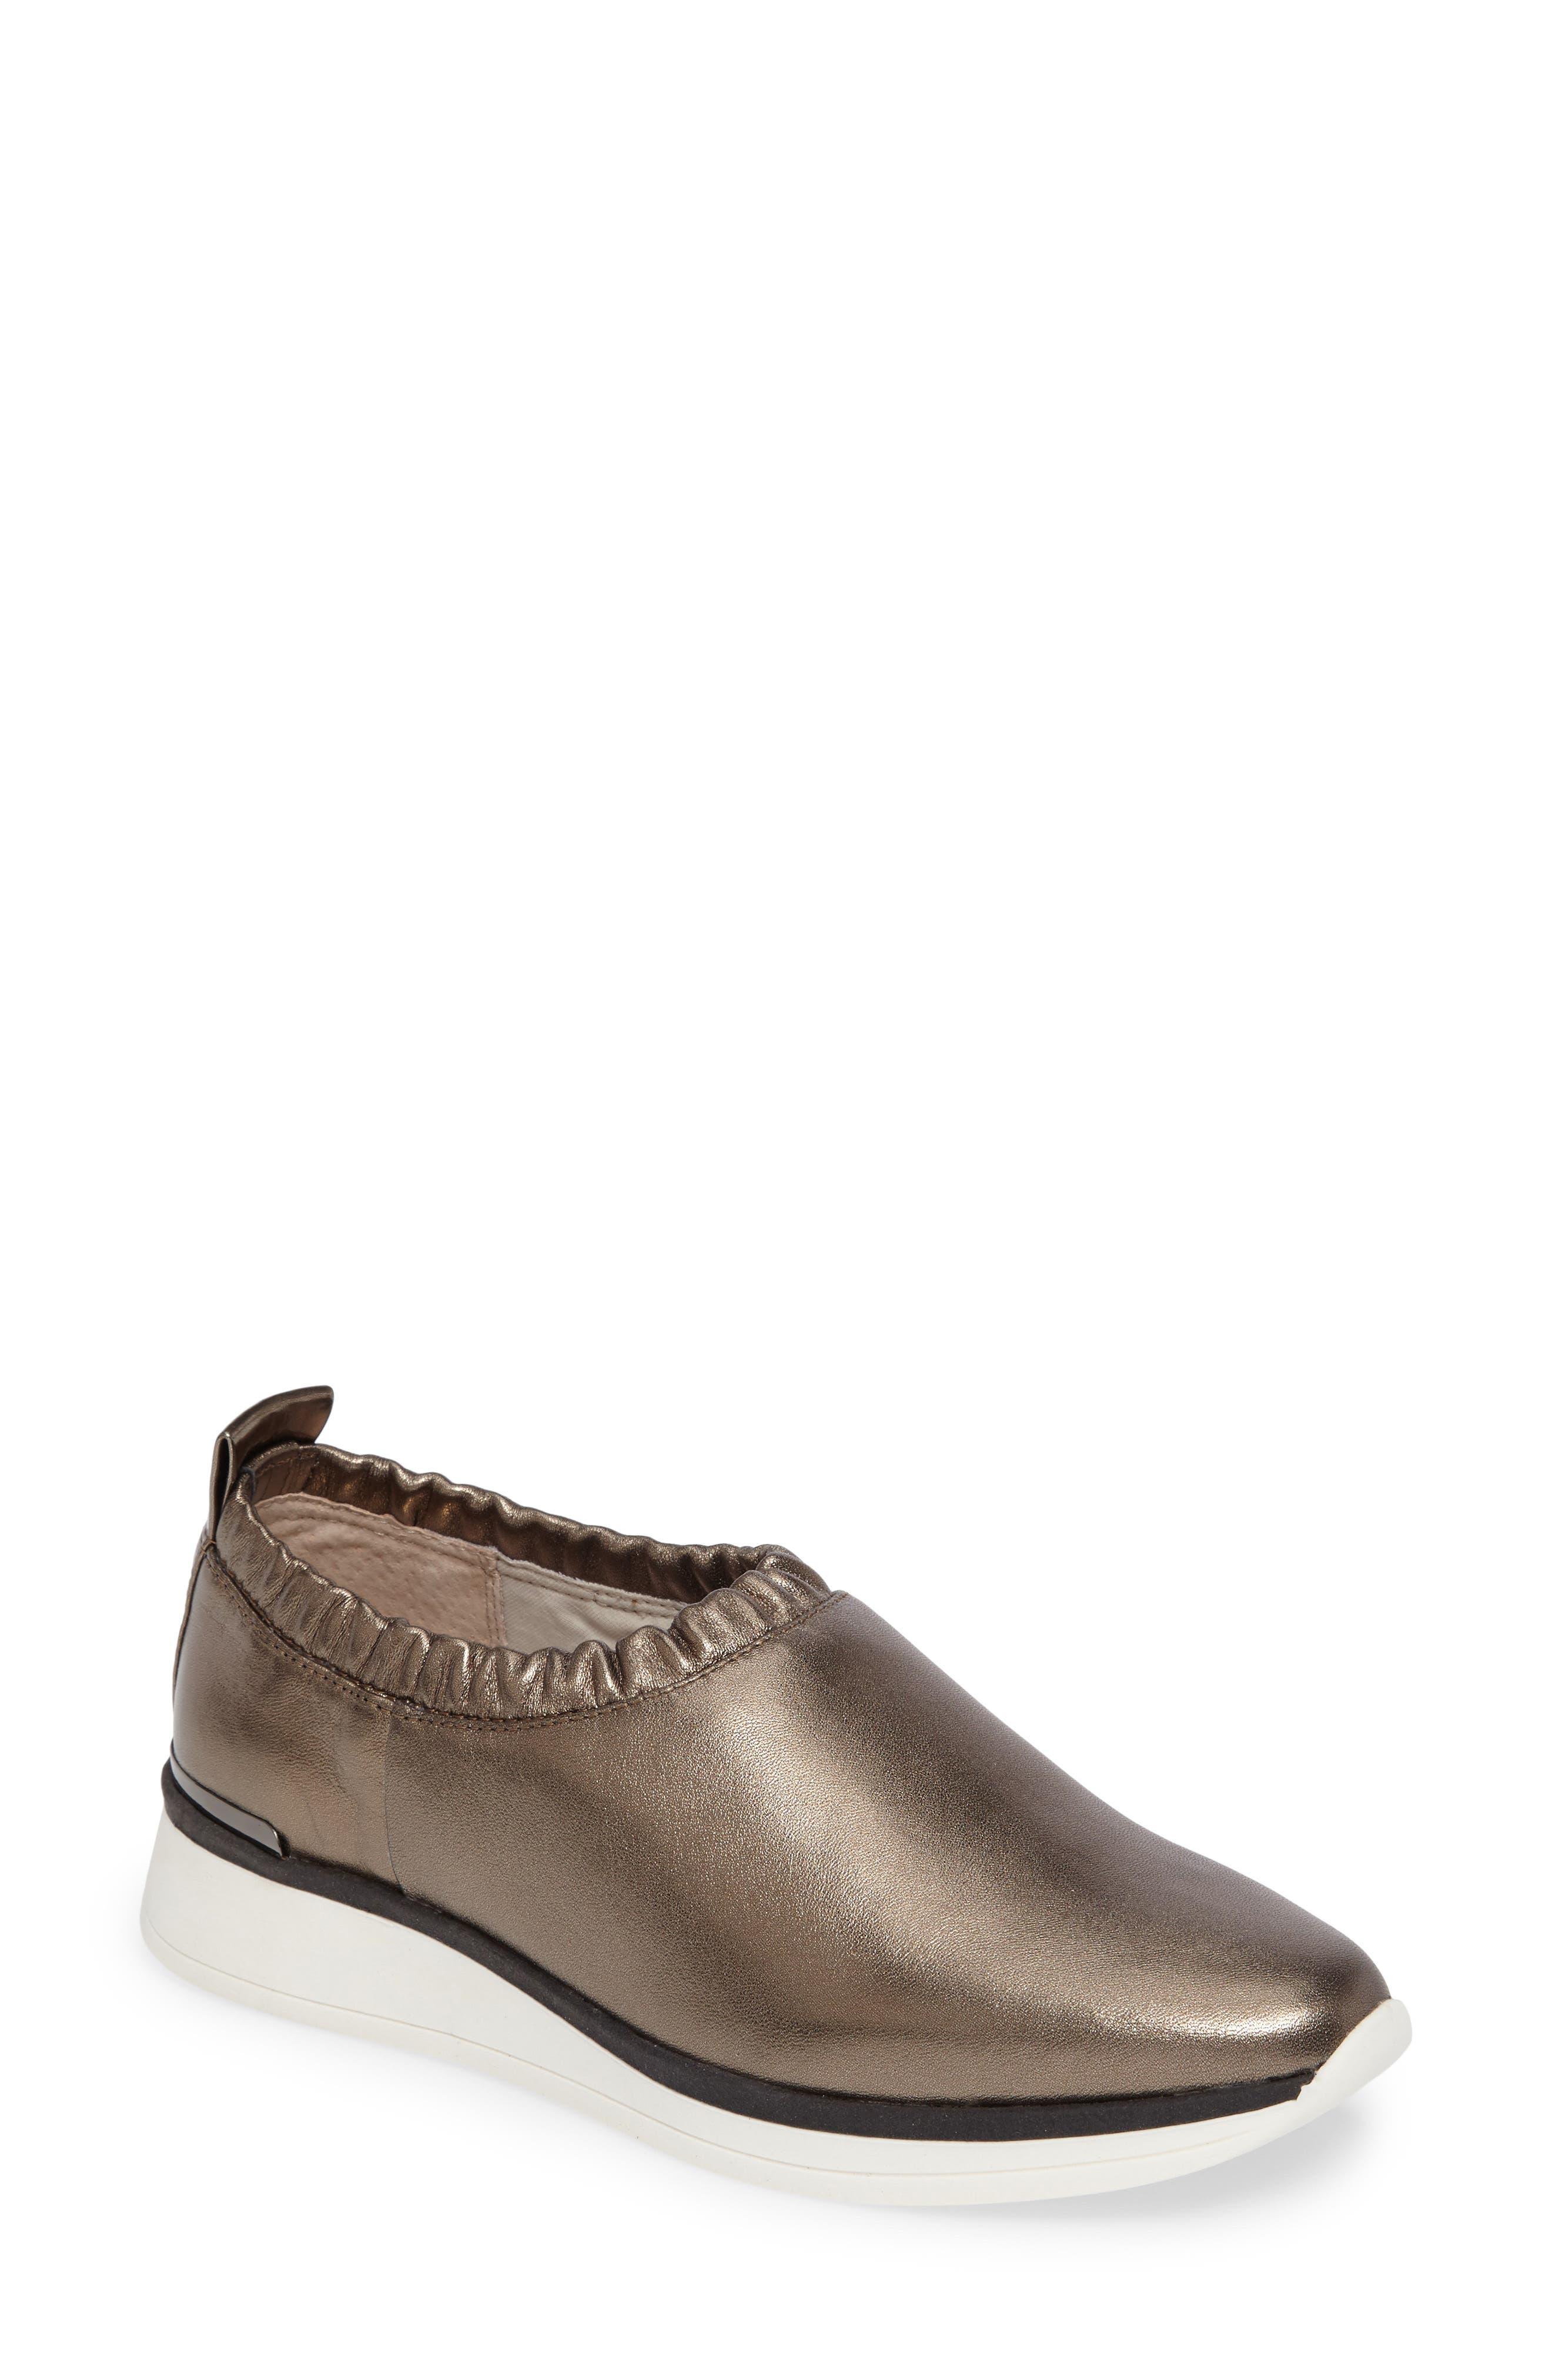 Brogen Slip-On Sneaker,                             Main thumbnail 1, color,                             Platina Leather